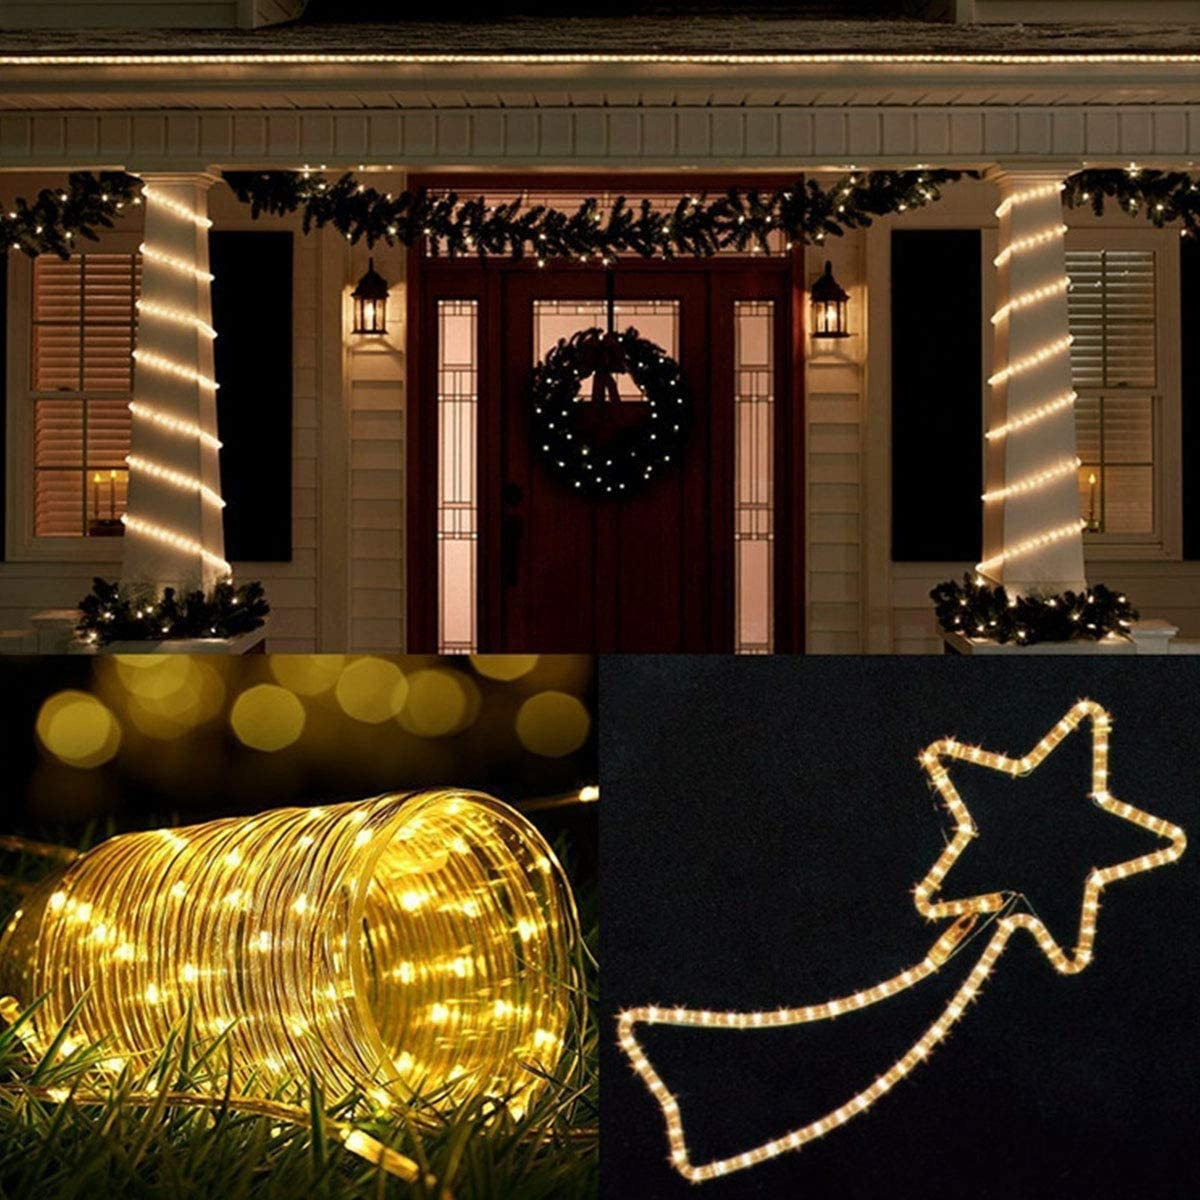 U'King-أنبوب قوس قزح led ، 12 مترًا ، 100 مصباح ، شريط إضاءة زخرفي ، مقاوم للماء ، للإجازات ، رأس السنة ، يوم الكريسماس